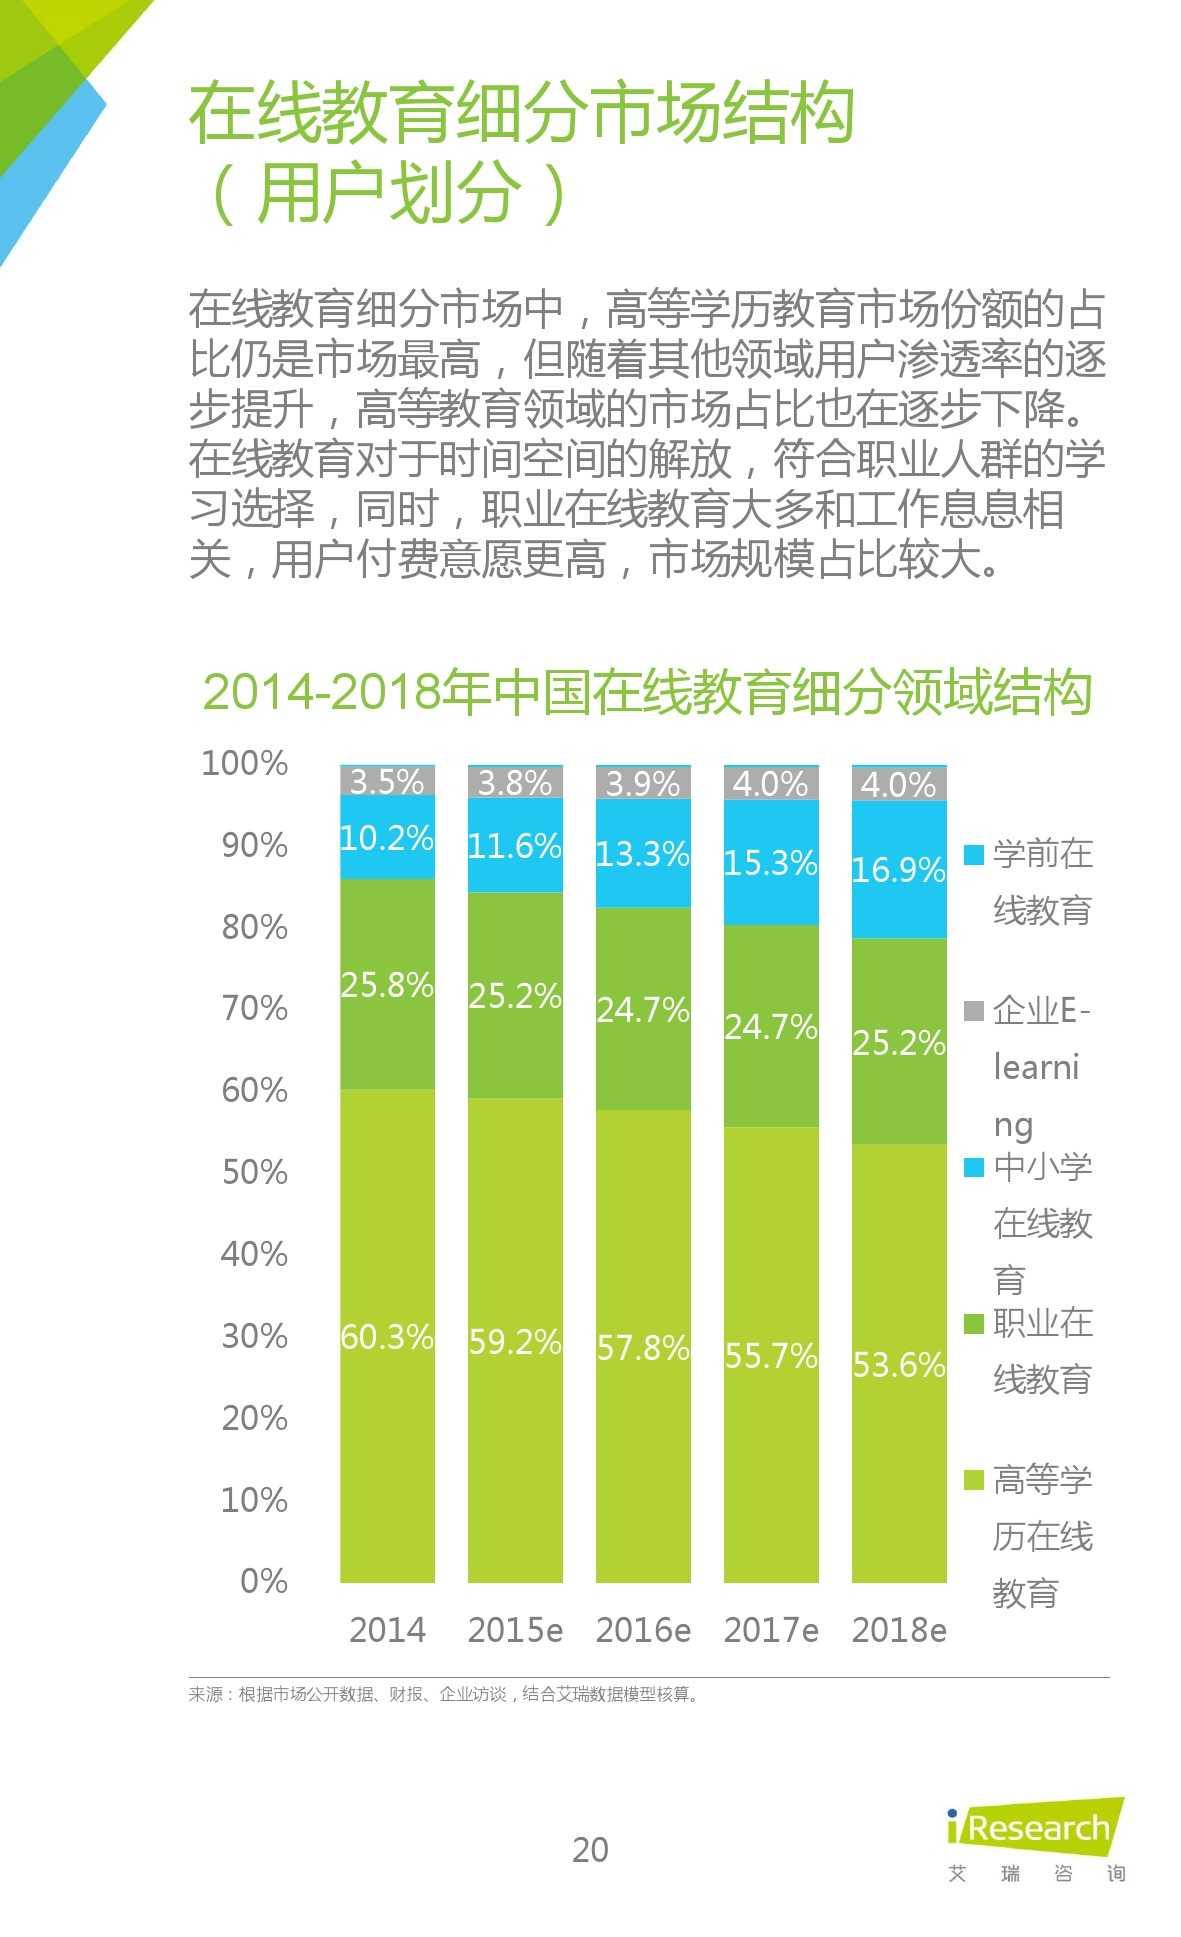 iResearch-2015年中国在线教育平台研究报告_000020